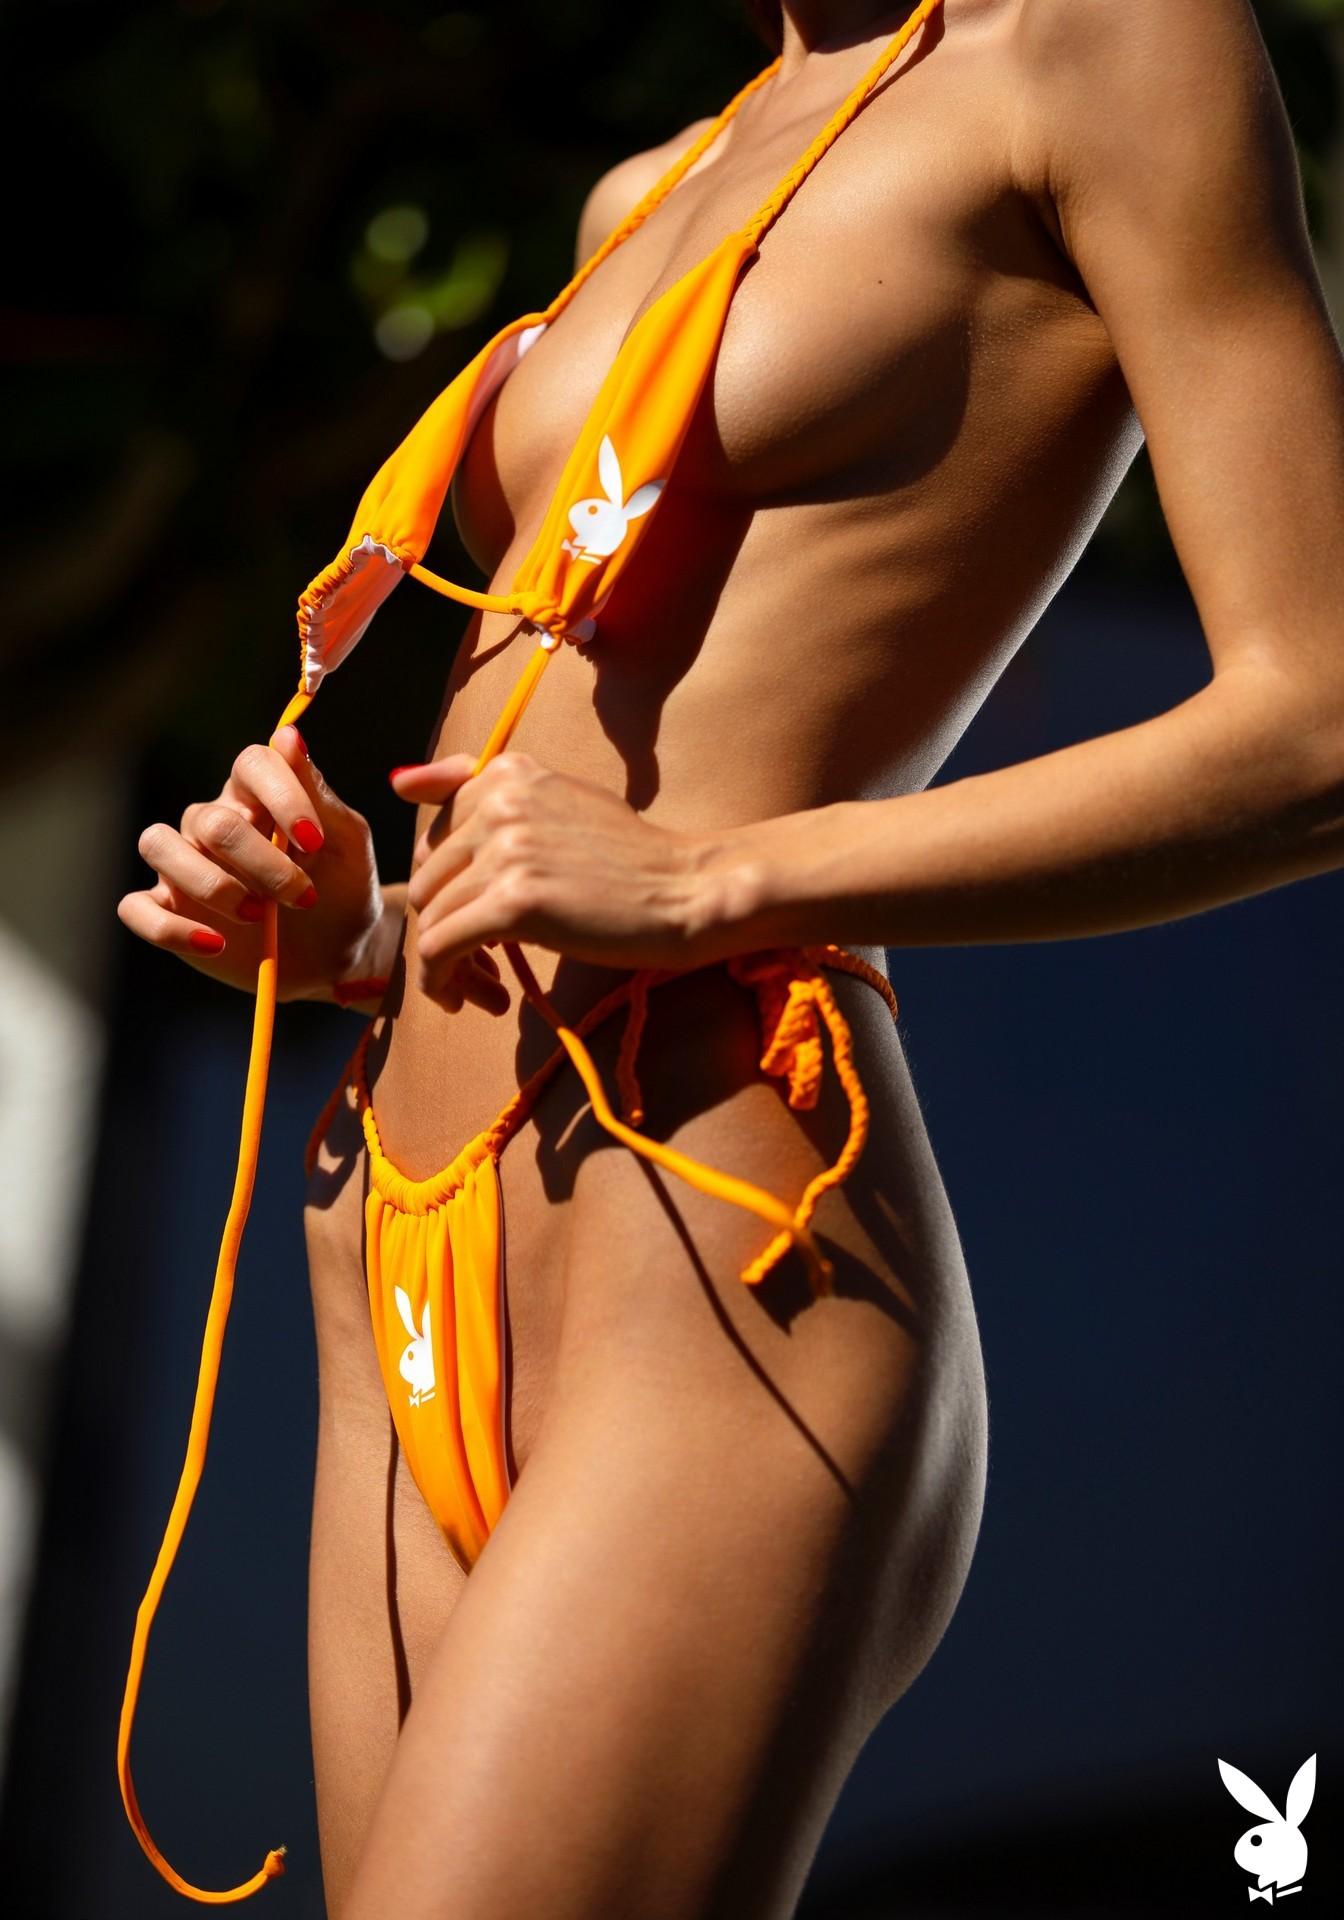 Cledia Fortin For Playboy International Playboy Plus (5)